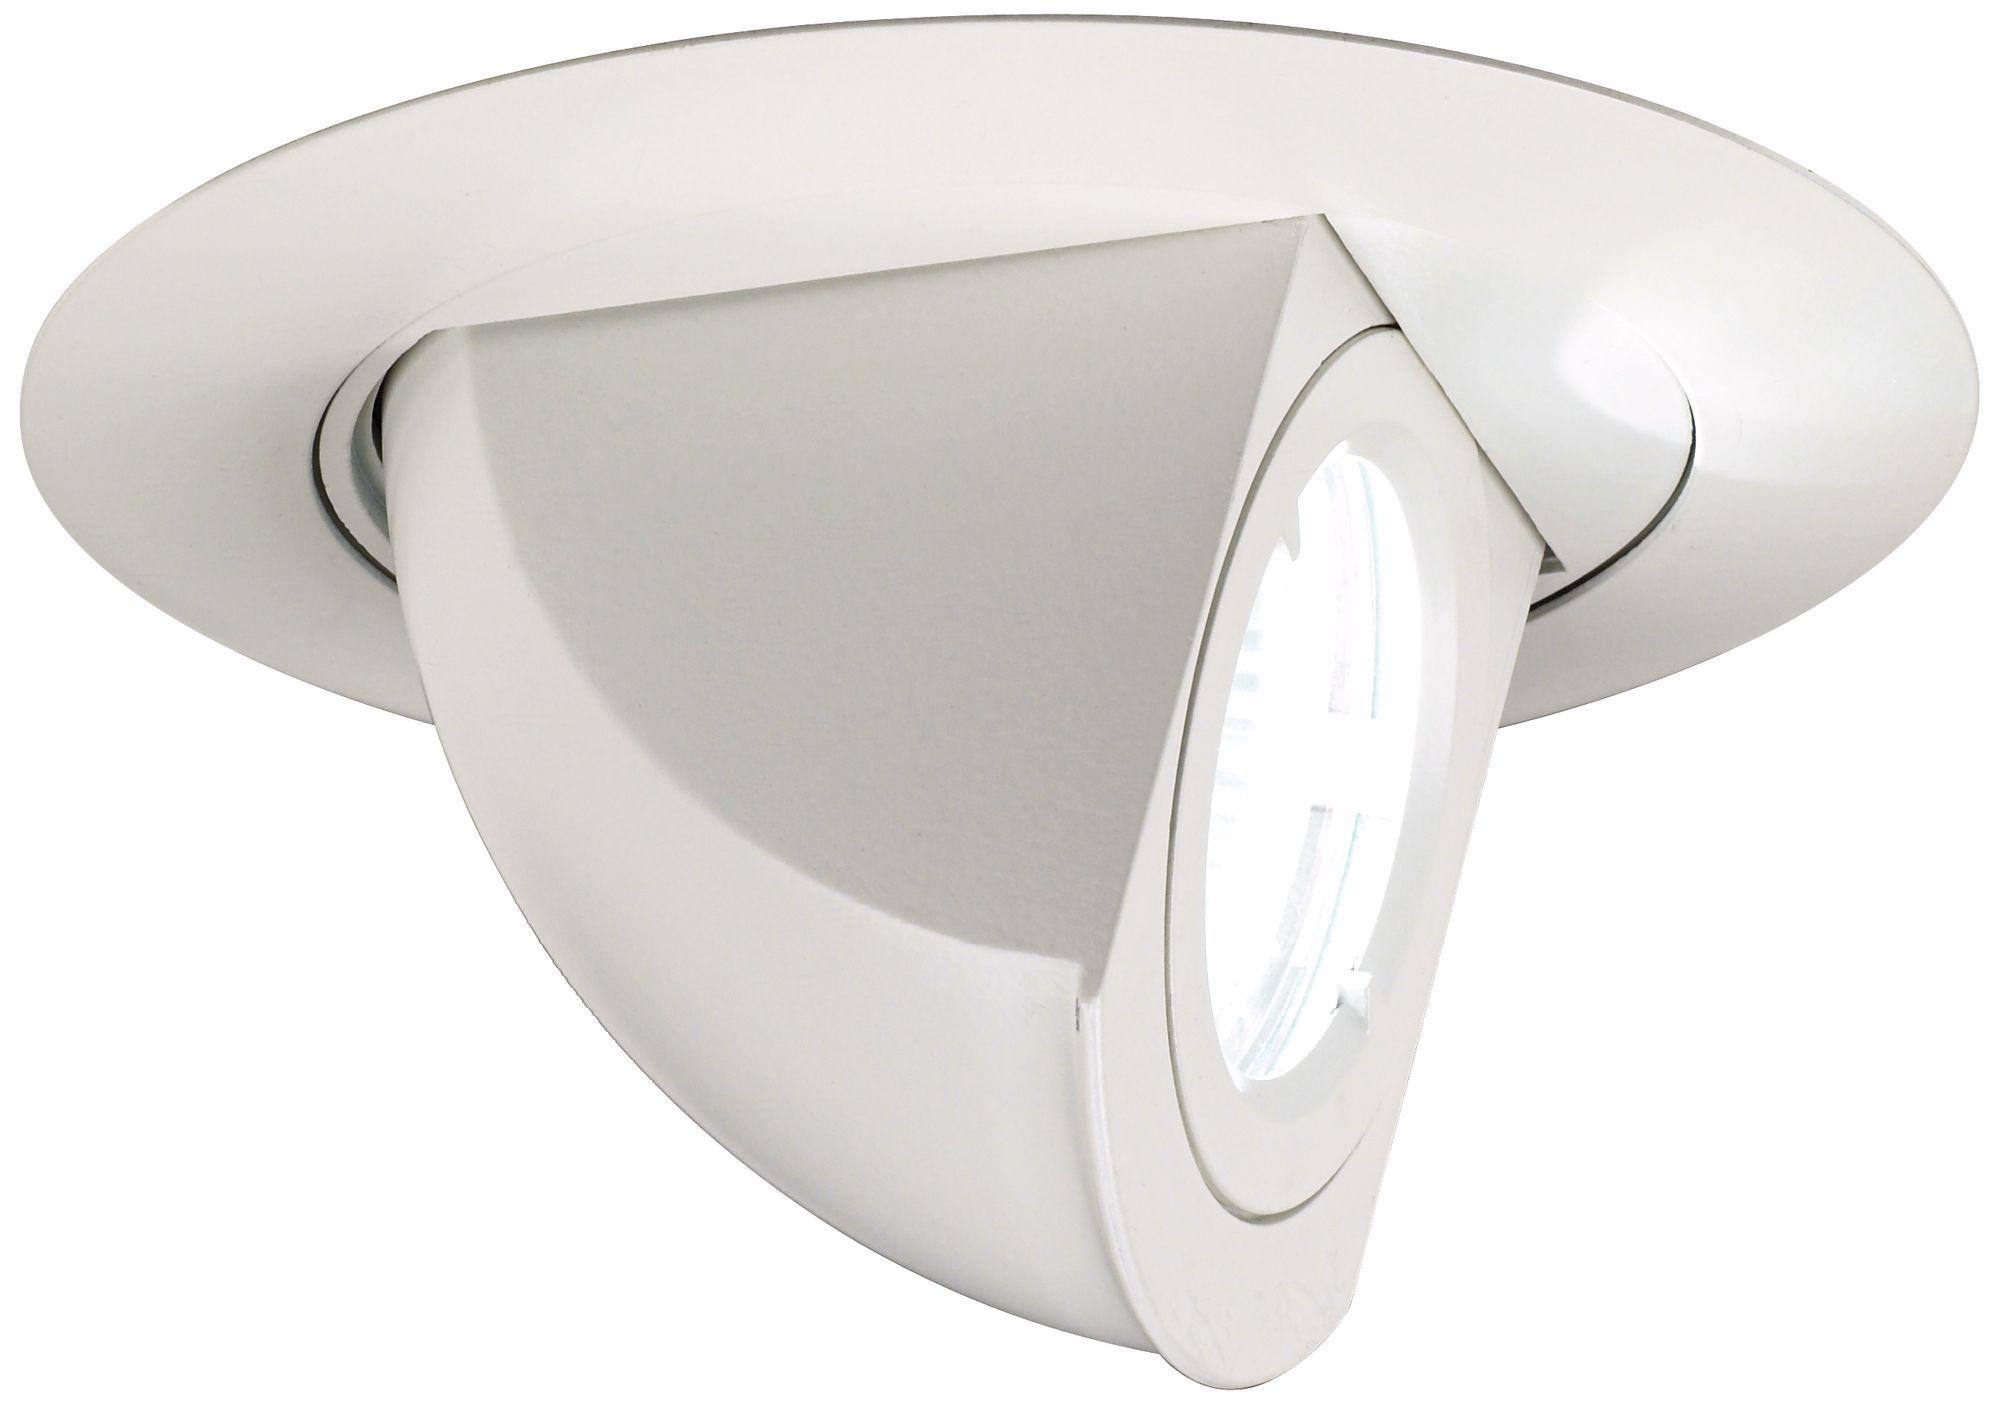 juno 4 low voltage adjustable angle recessed light trim